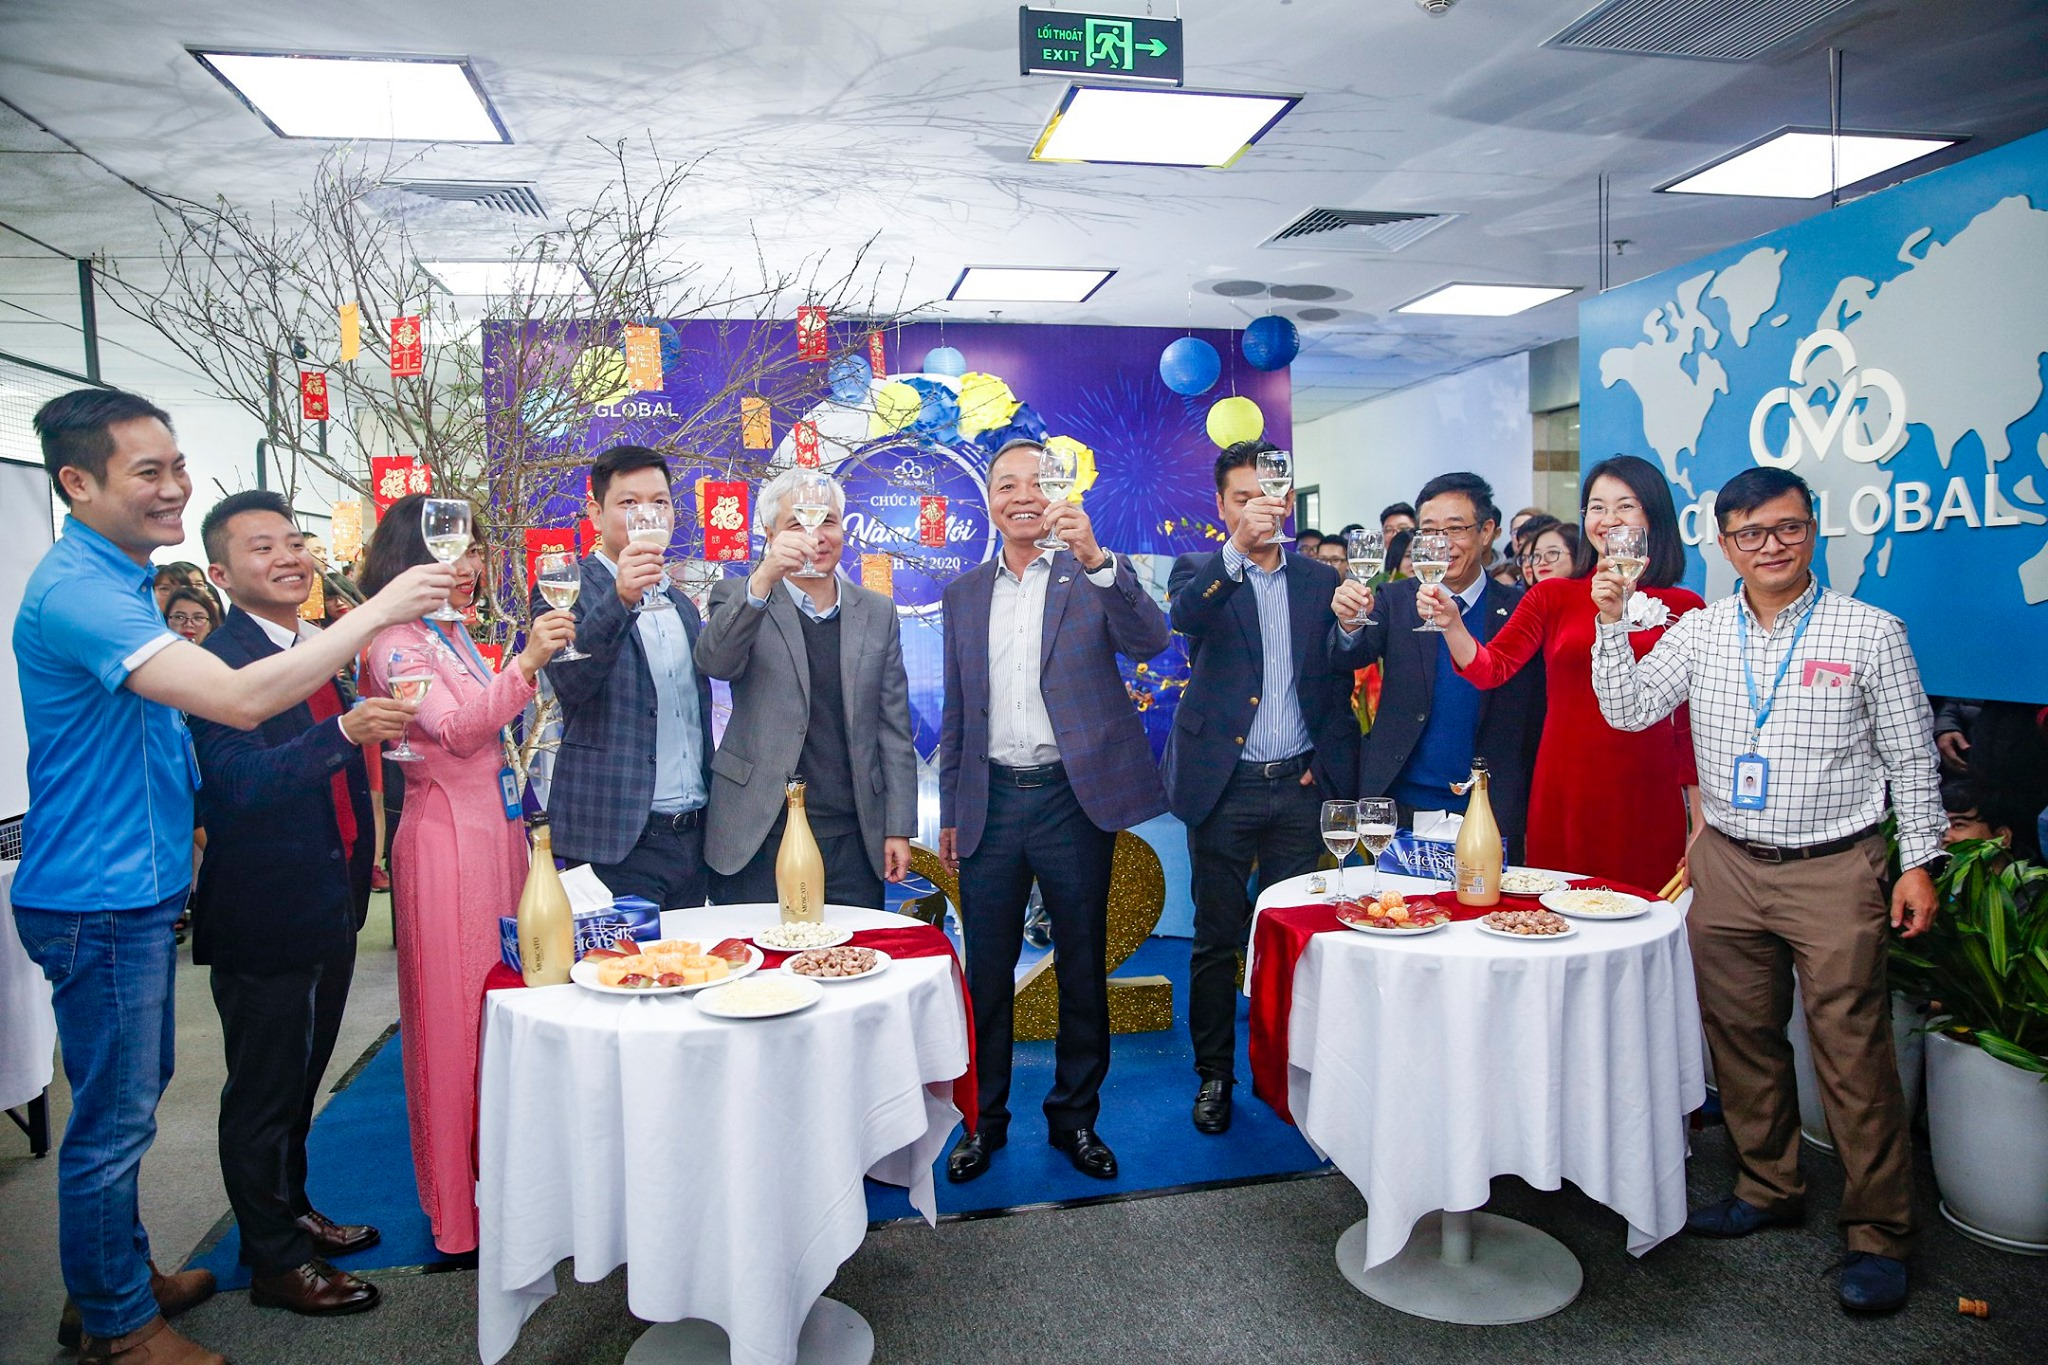 CMC Global welcomes Lunar New Year 2020